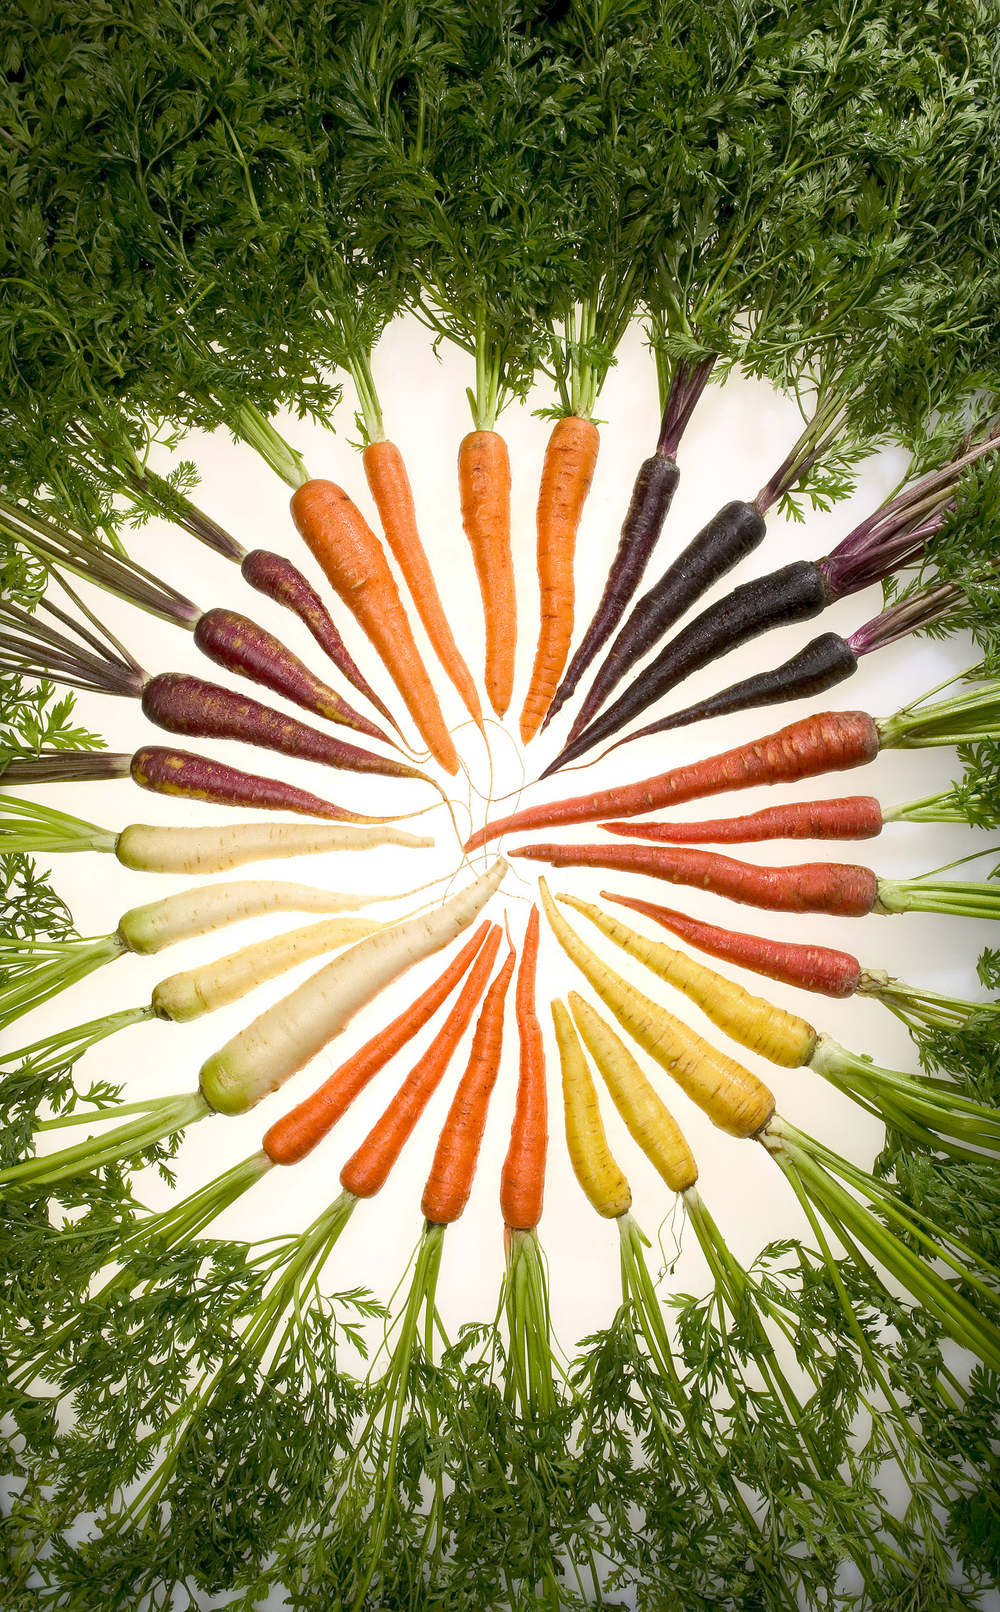 Carrots_of_many_colors.jpg